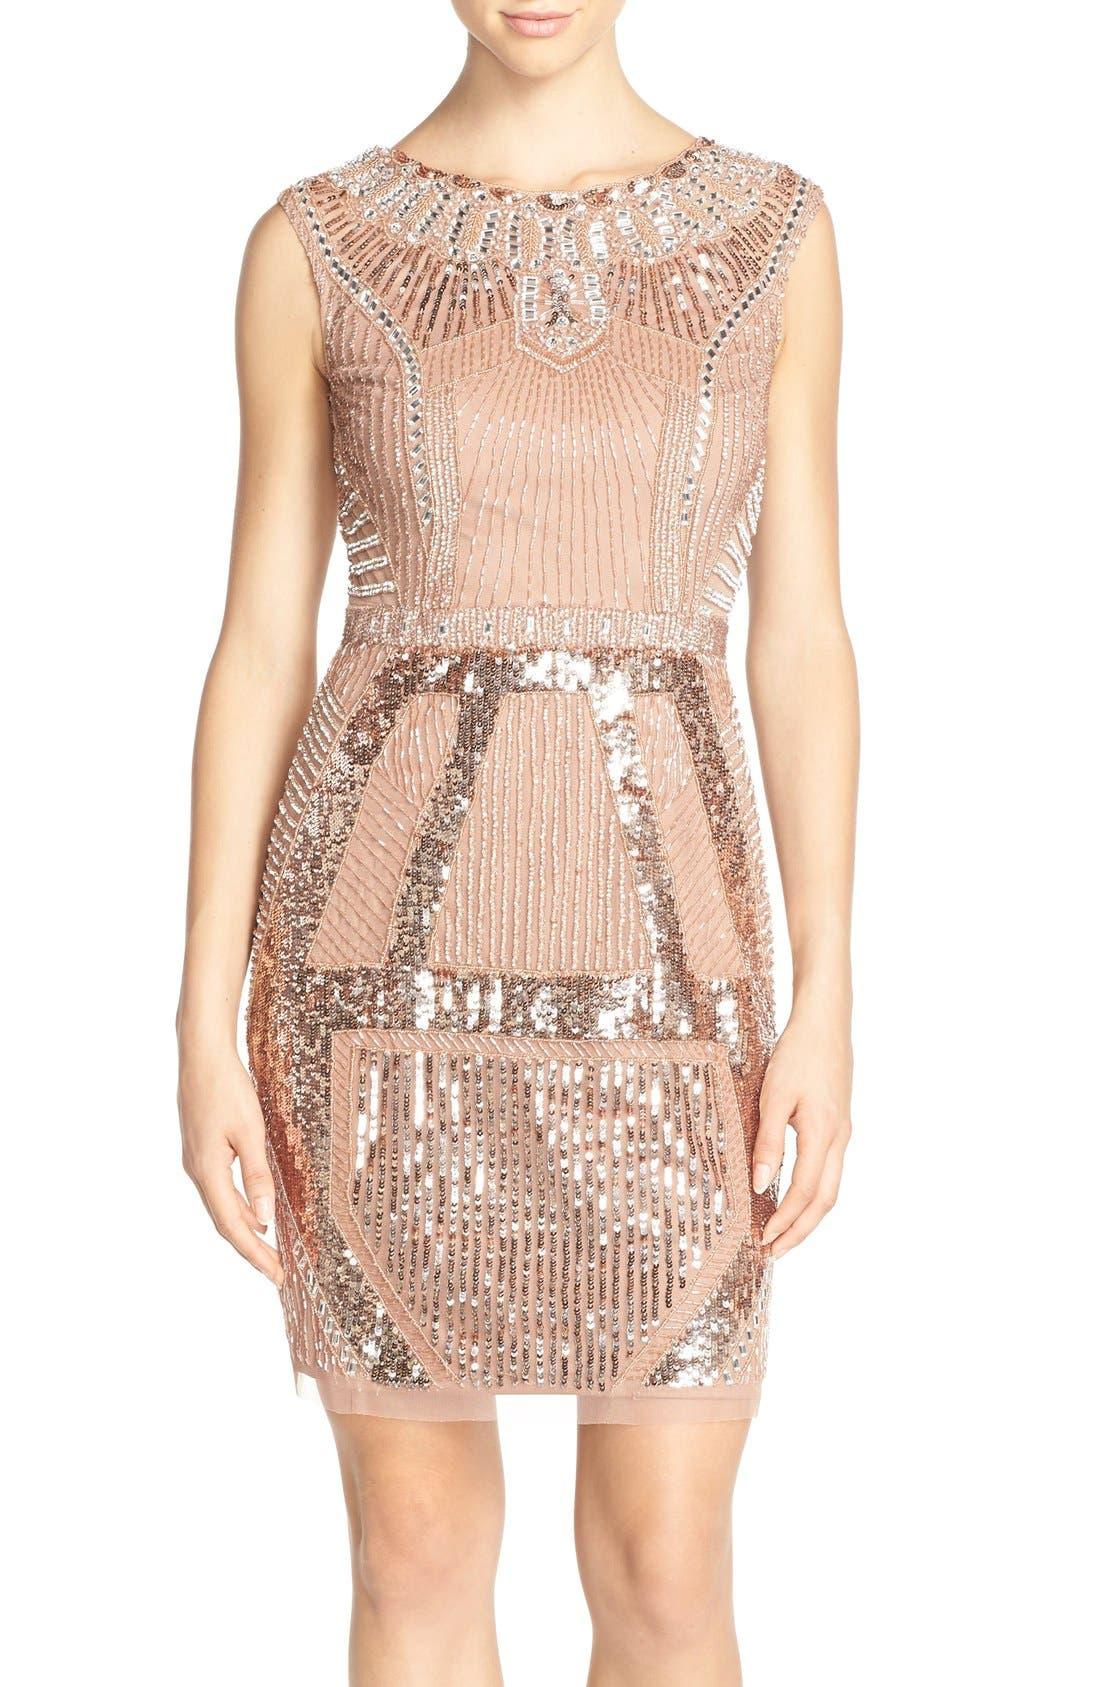 Alternate Image 1 Selected - Aidan Mattox Embellished Sleeveless Dress